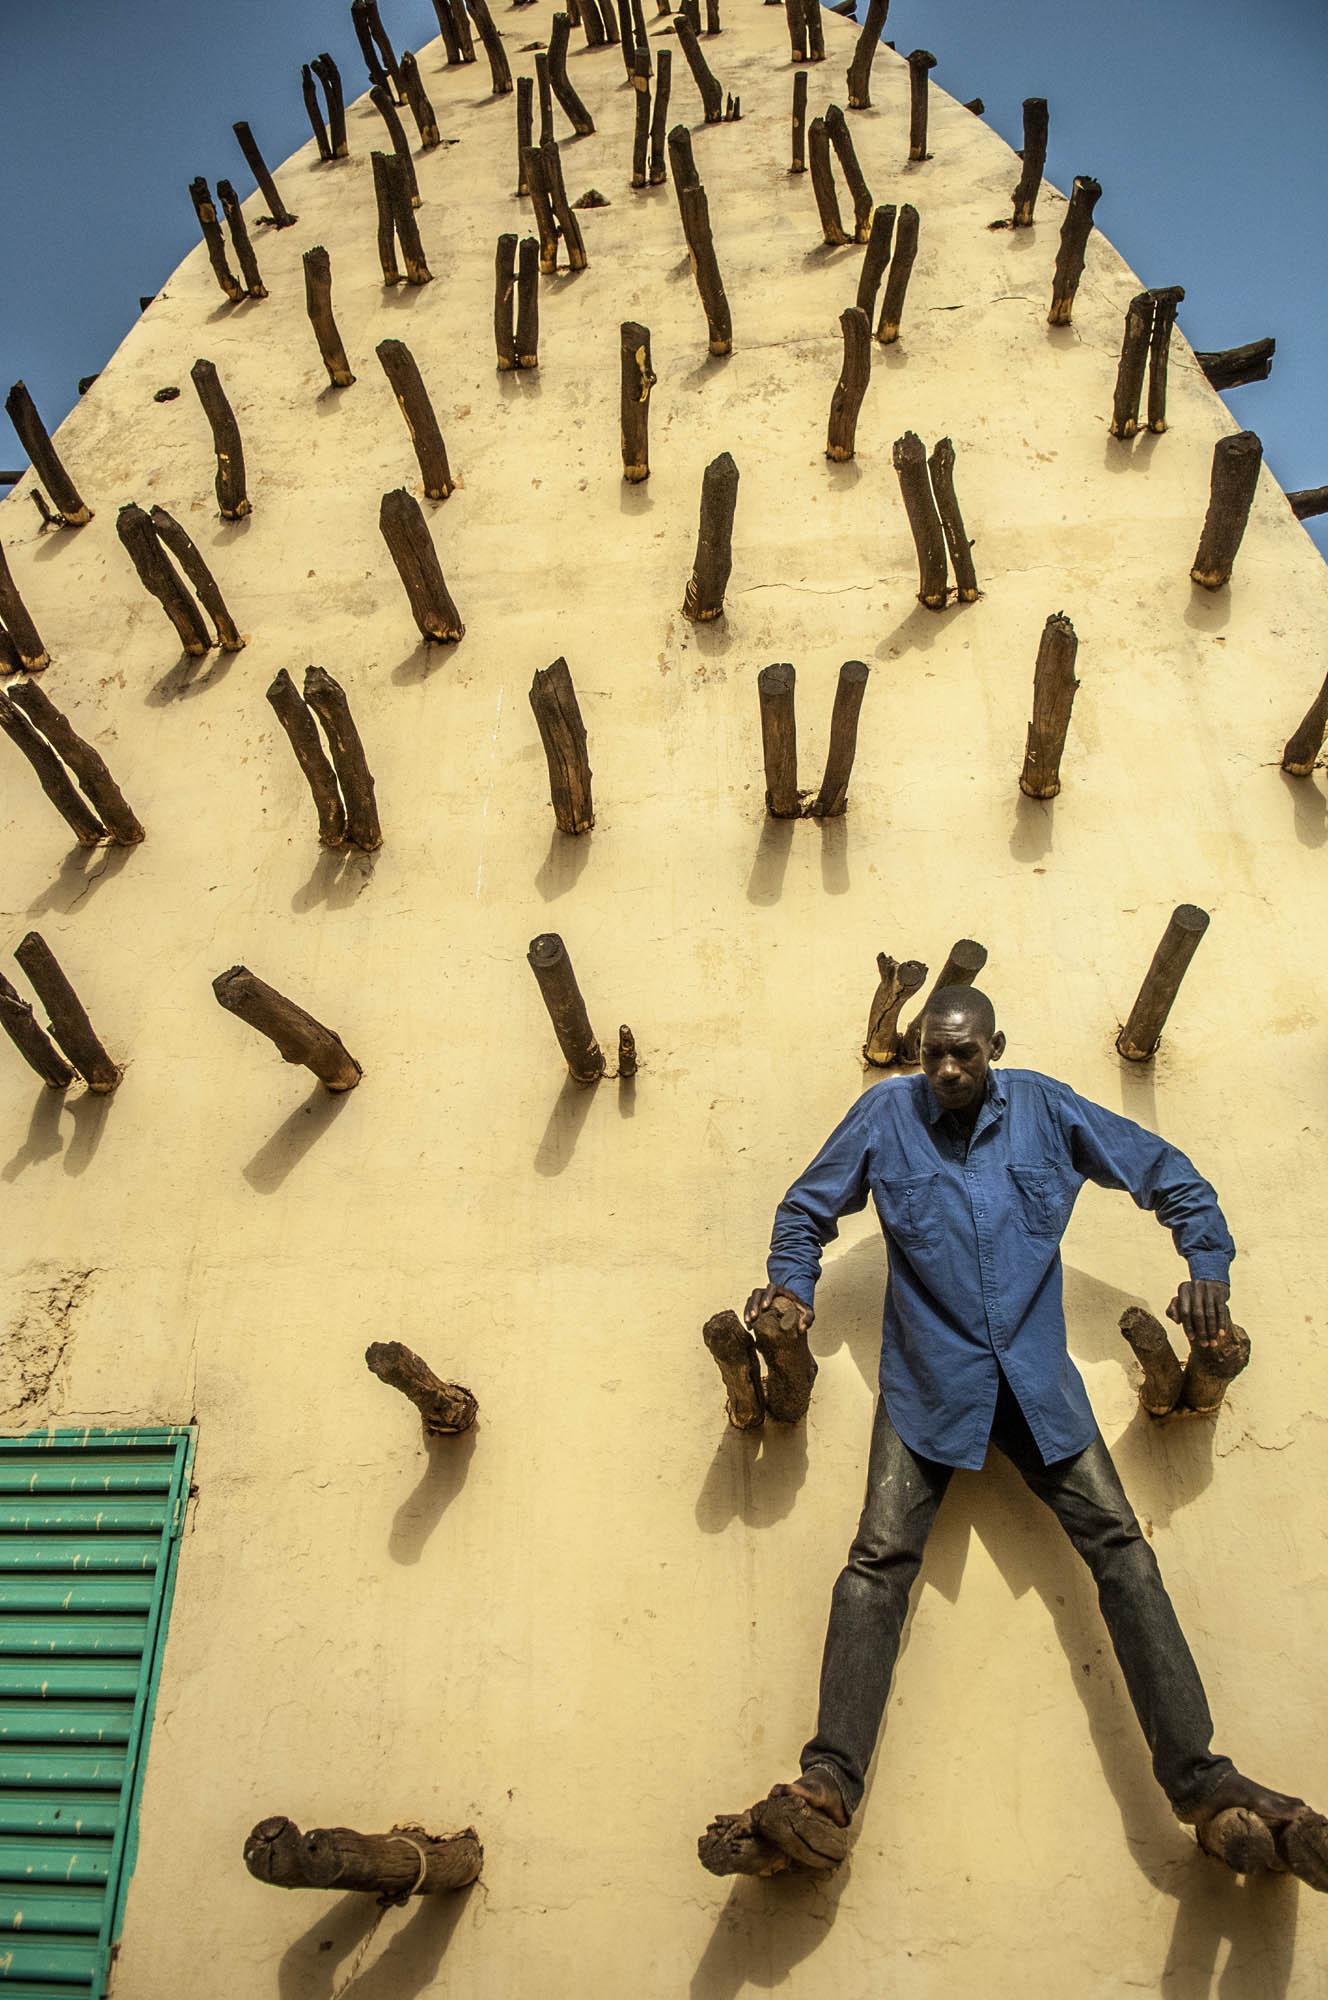 Burkina Faso - Ethnoland - Hector Garrido, Aerial and human photography